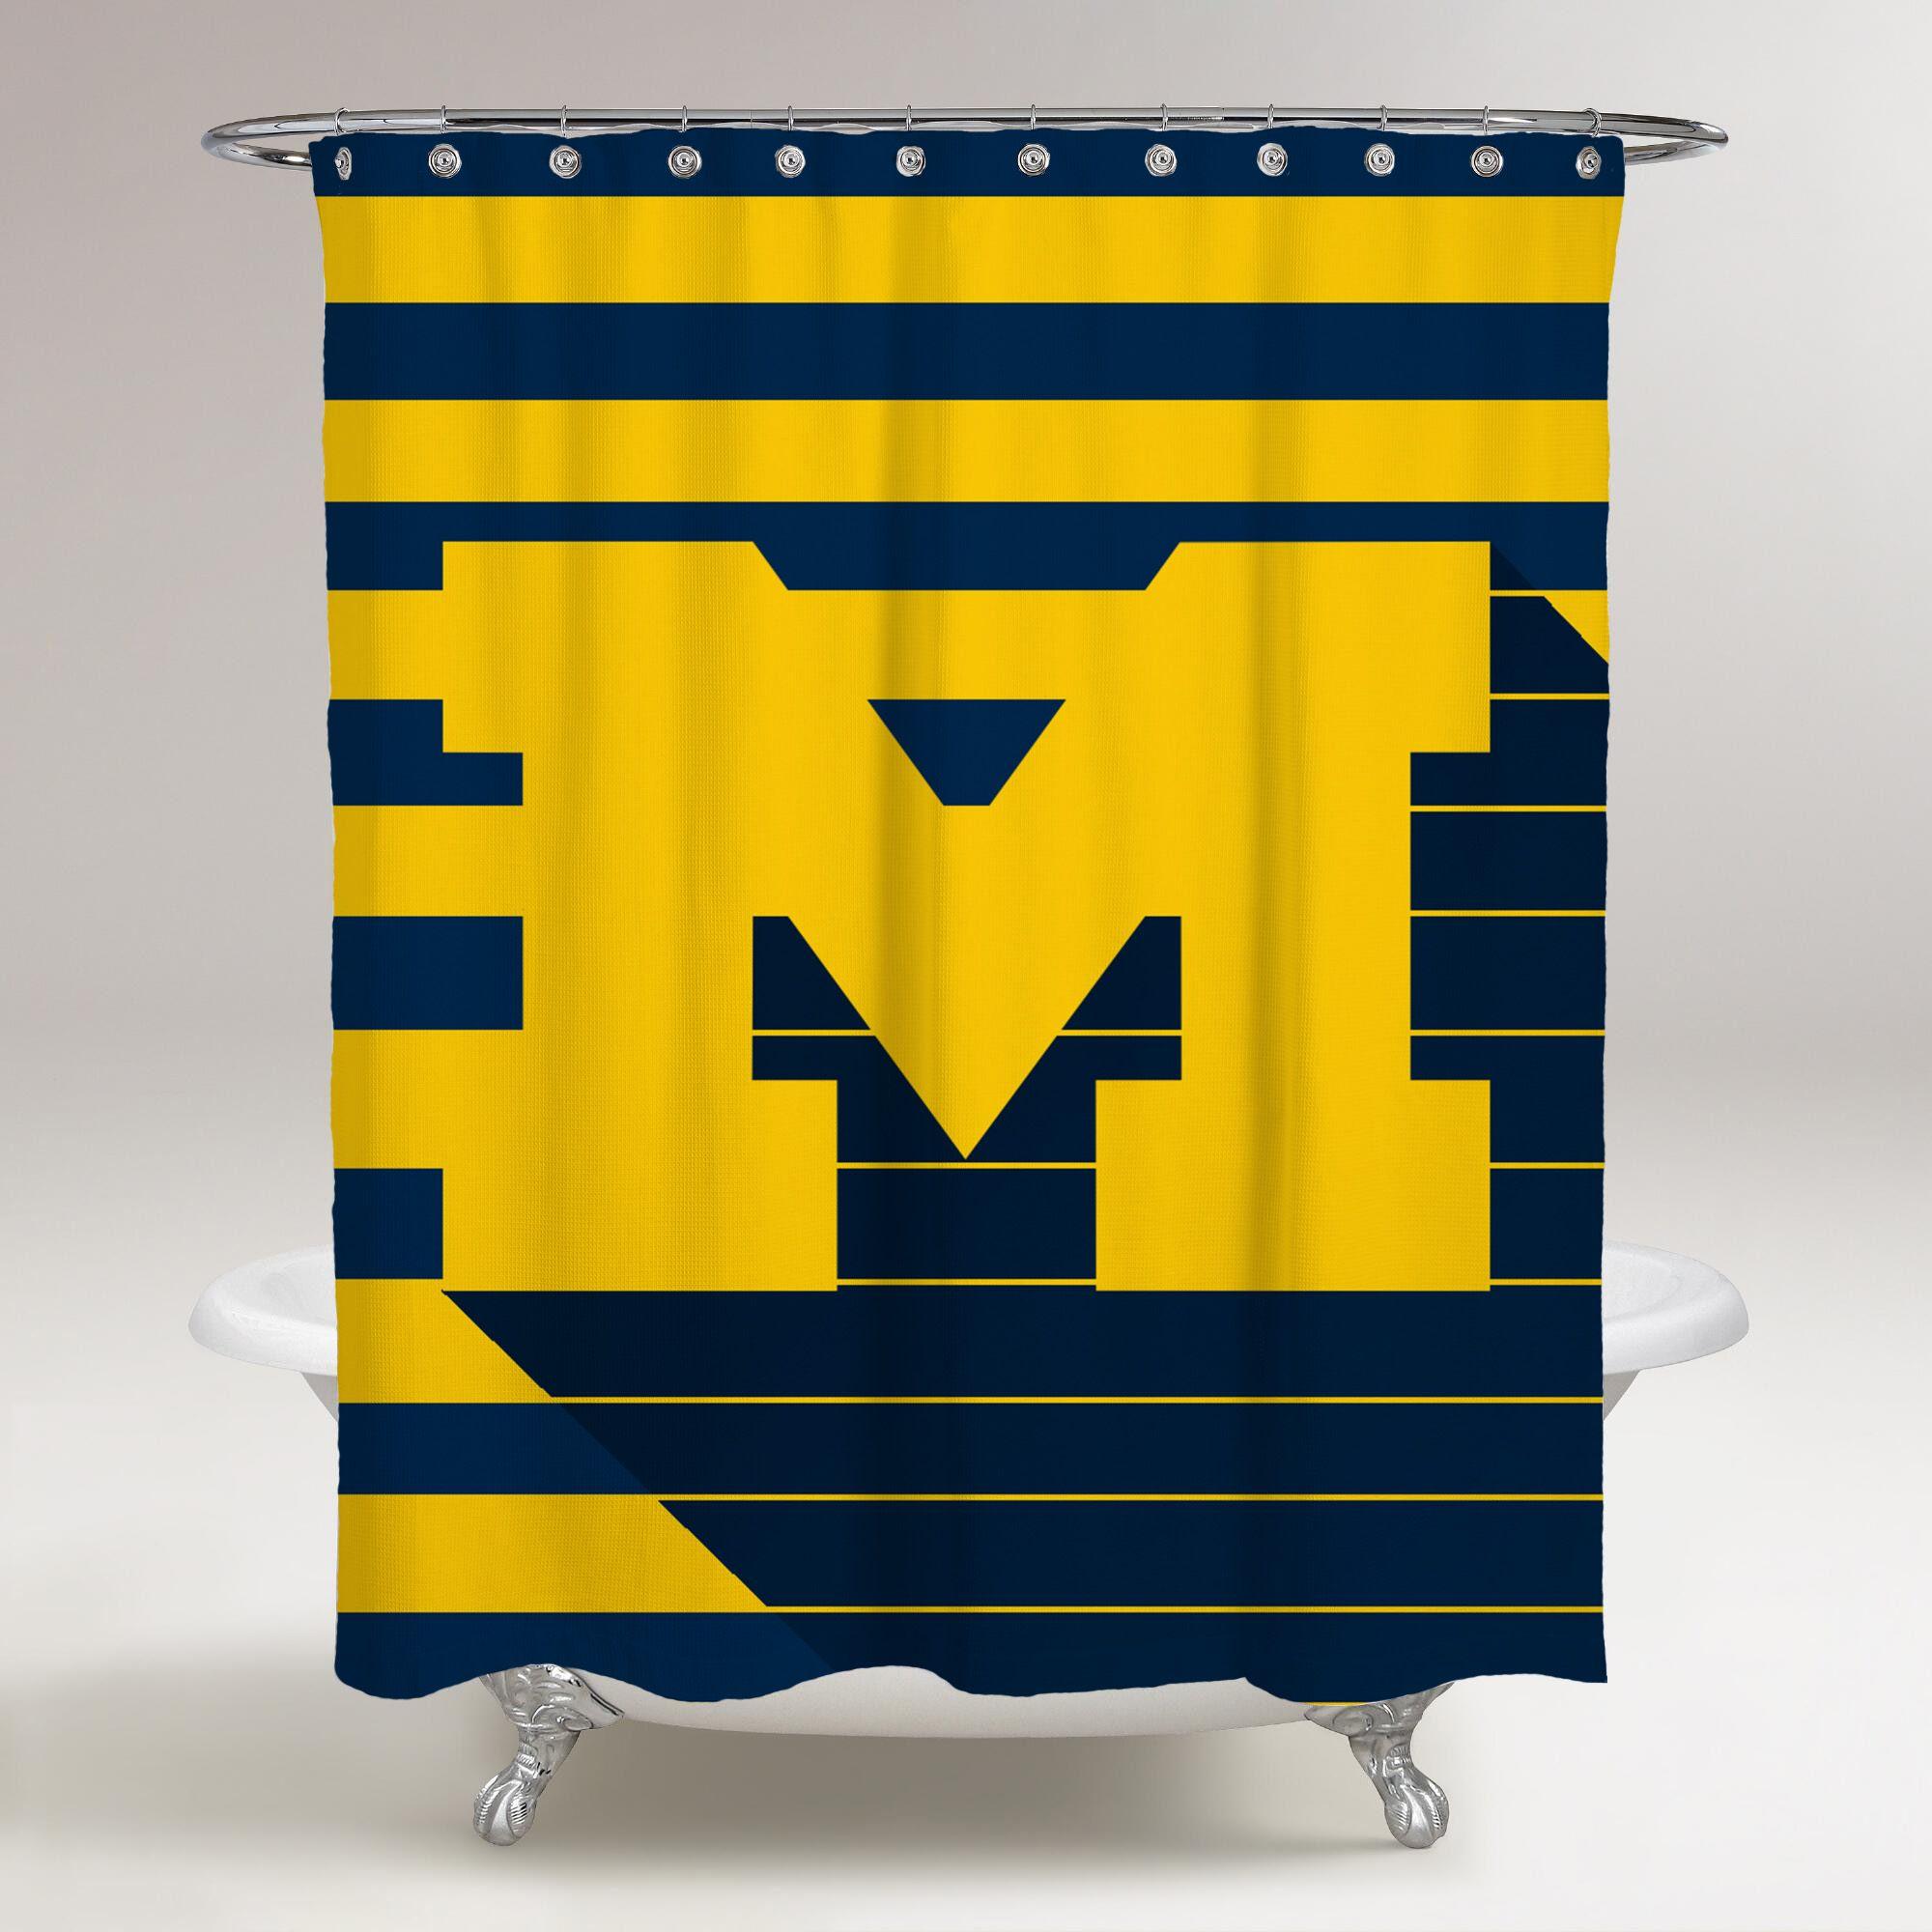 Michigan Wolverines Logo M Printed Shower Curtain Bathroom Decor Price Free Shipping Rareg Bathroom Shower Curtains Shower Curtain Printed Shower Curtain